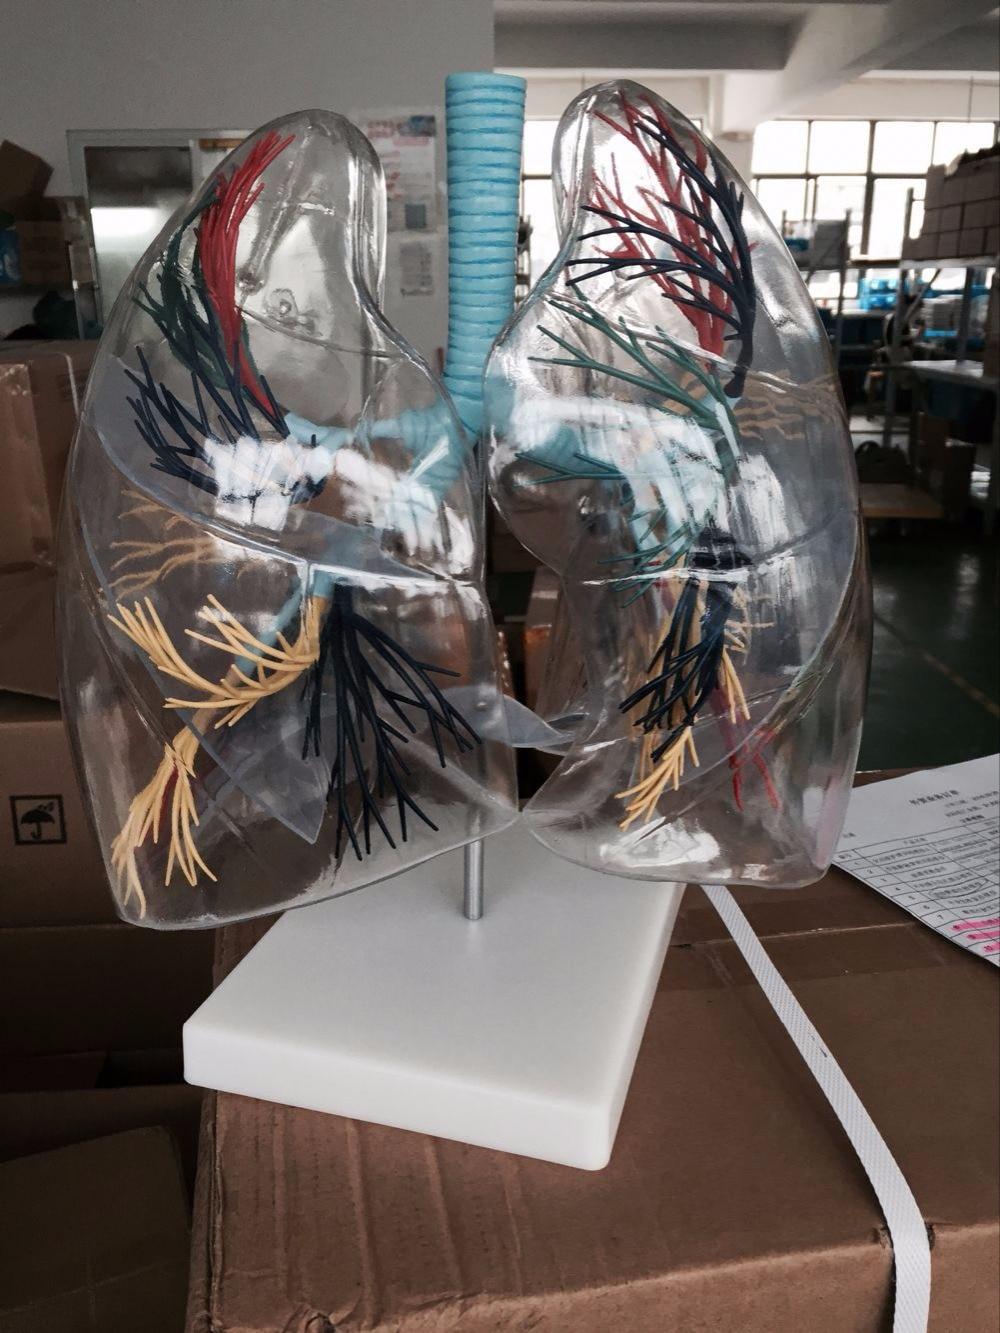 BIX-A1058 Transparent Lung Segment Anatomical Model WBW246